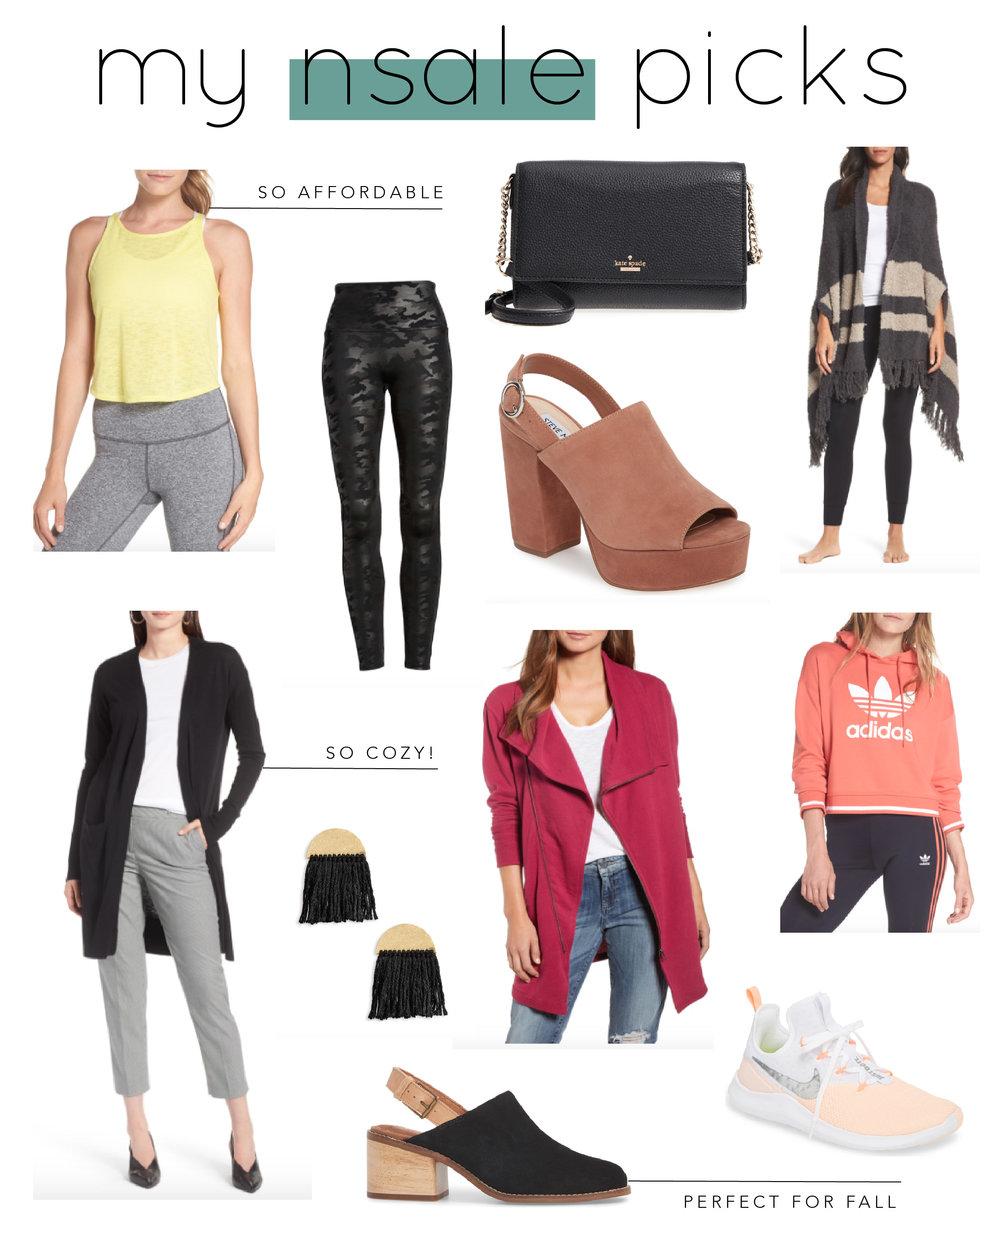 Neon workout tank  |  Camo faux leather leggings  |  Cross body bag  |  striped wrap  |  slingback platforms  |  long pocket cardi  |  fringe earrings  |  Drape collar jacket  |  cropped hoodie  |  Nike Sneakers  |  Slingback Mules